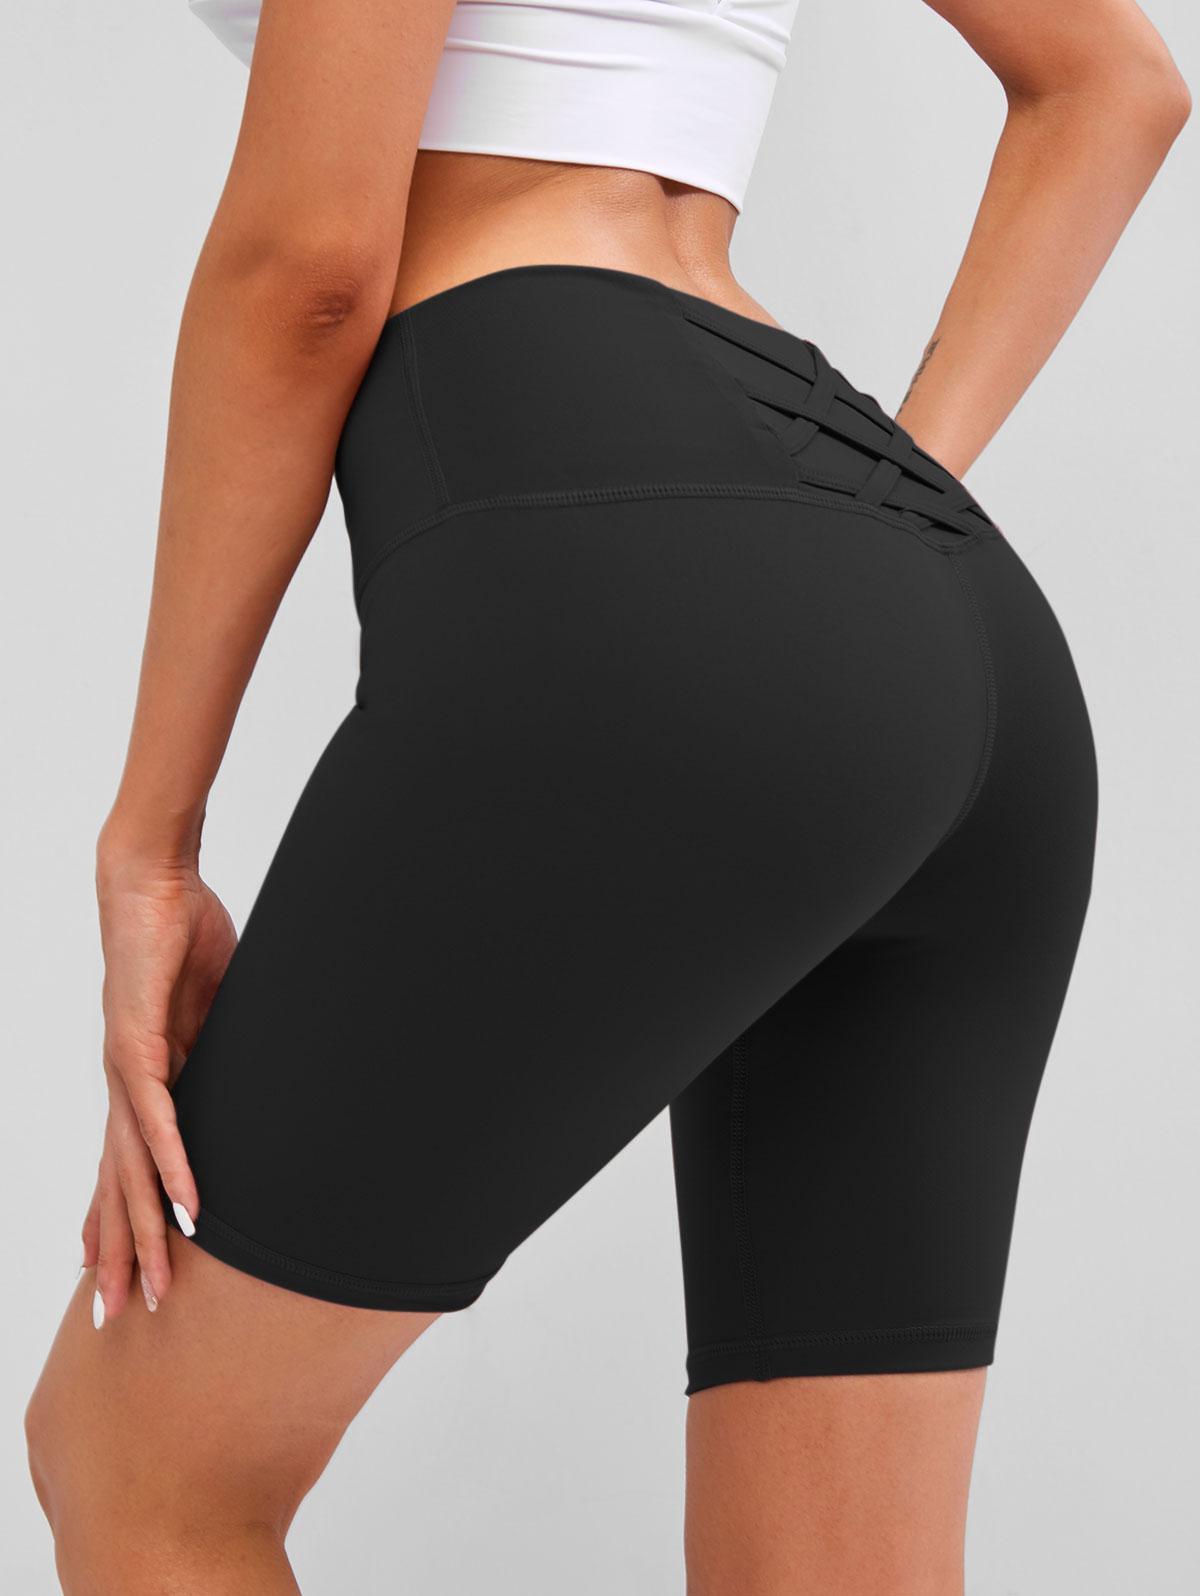 Wide Waistband Lattice Topstitch Biker Shorts